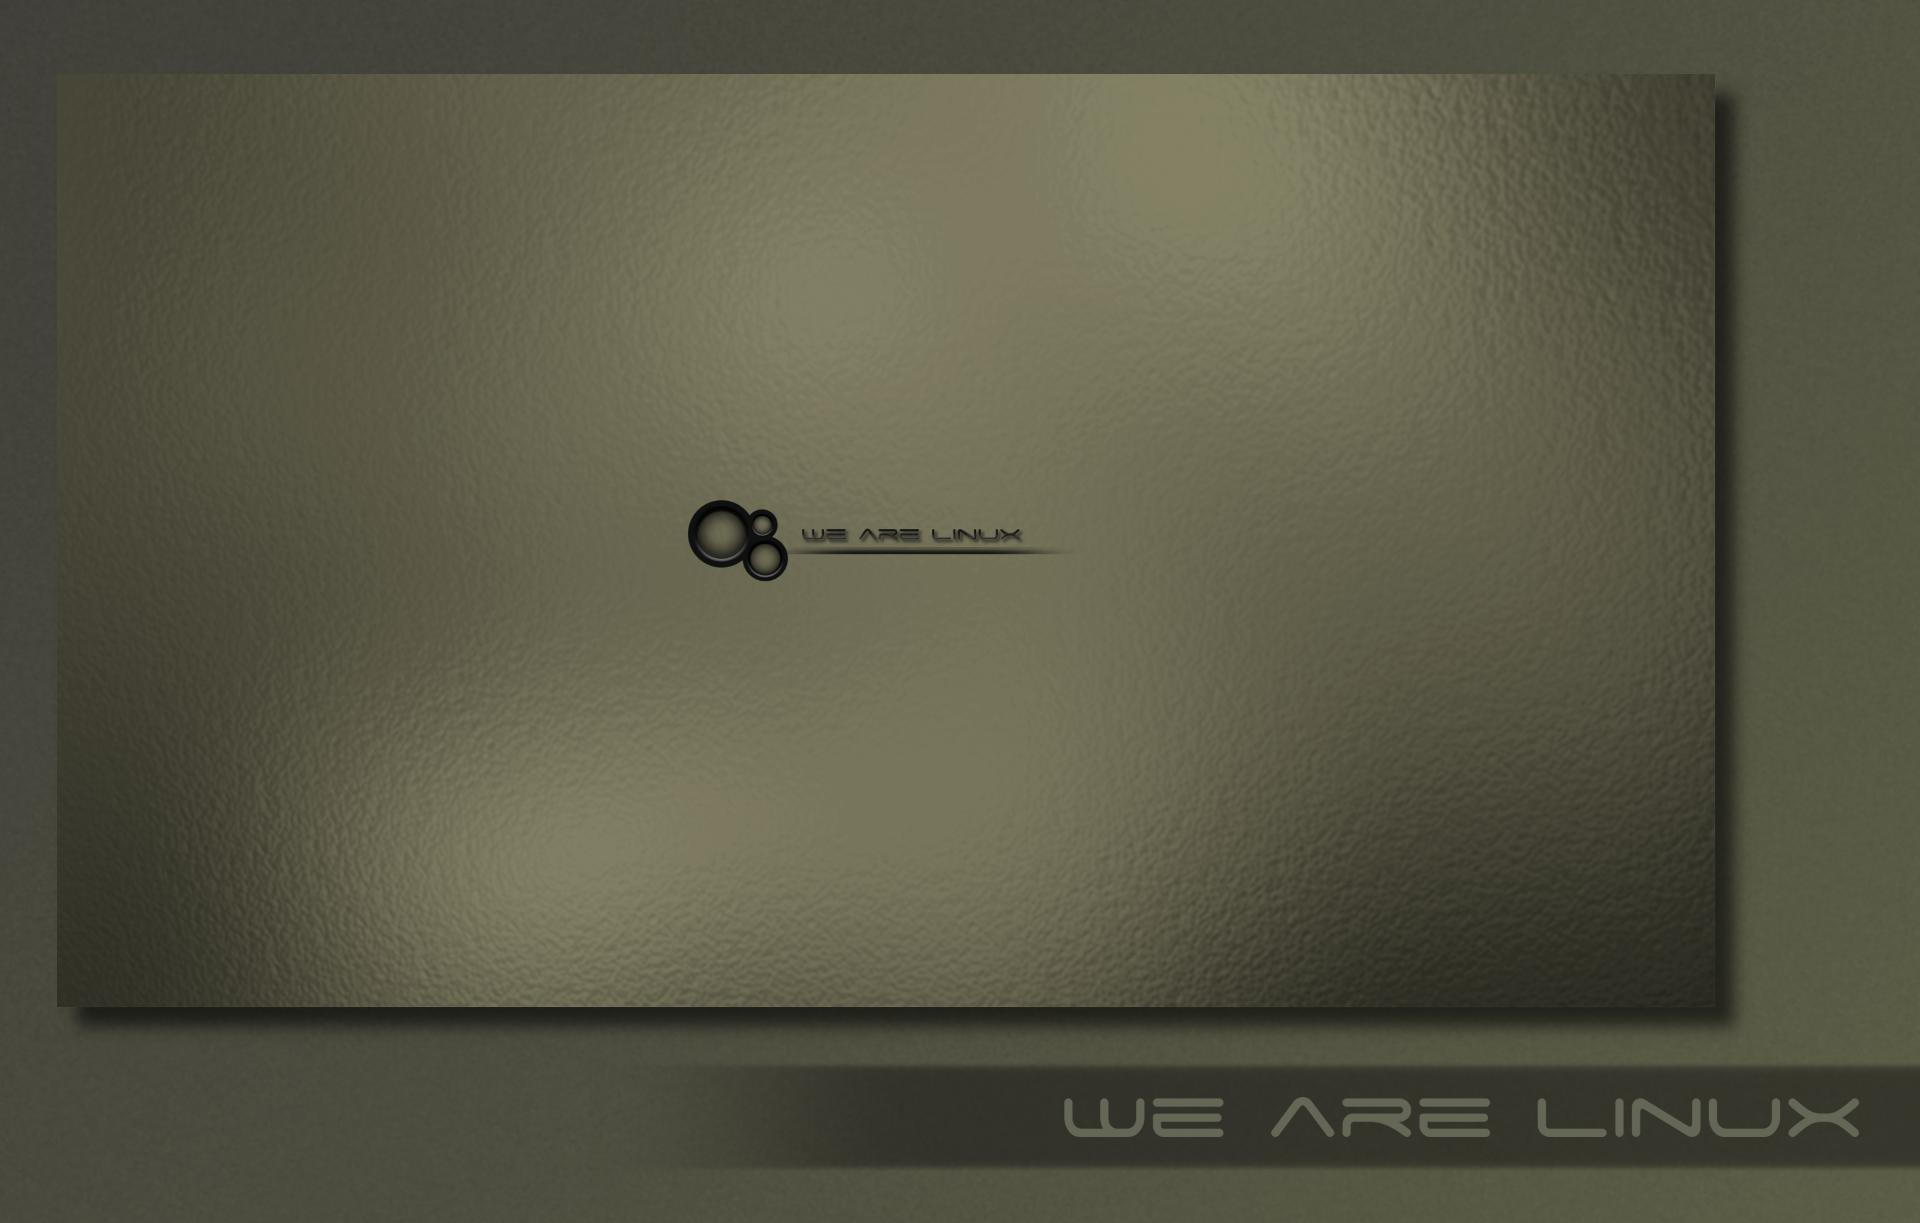 We Are Linux 2 by miguelsanchez666